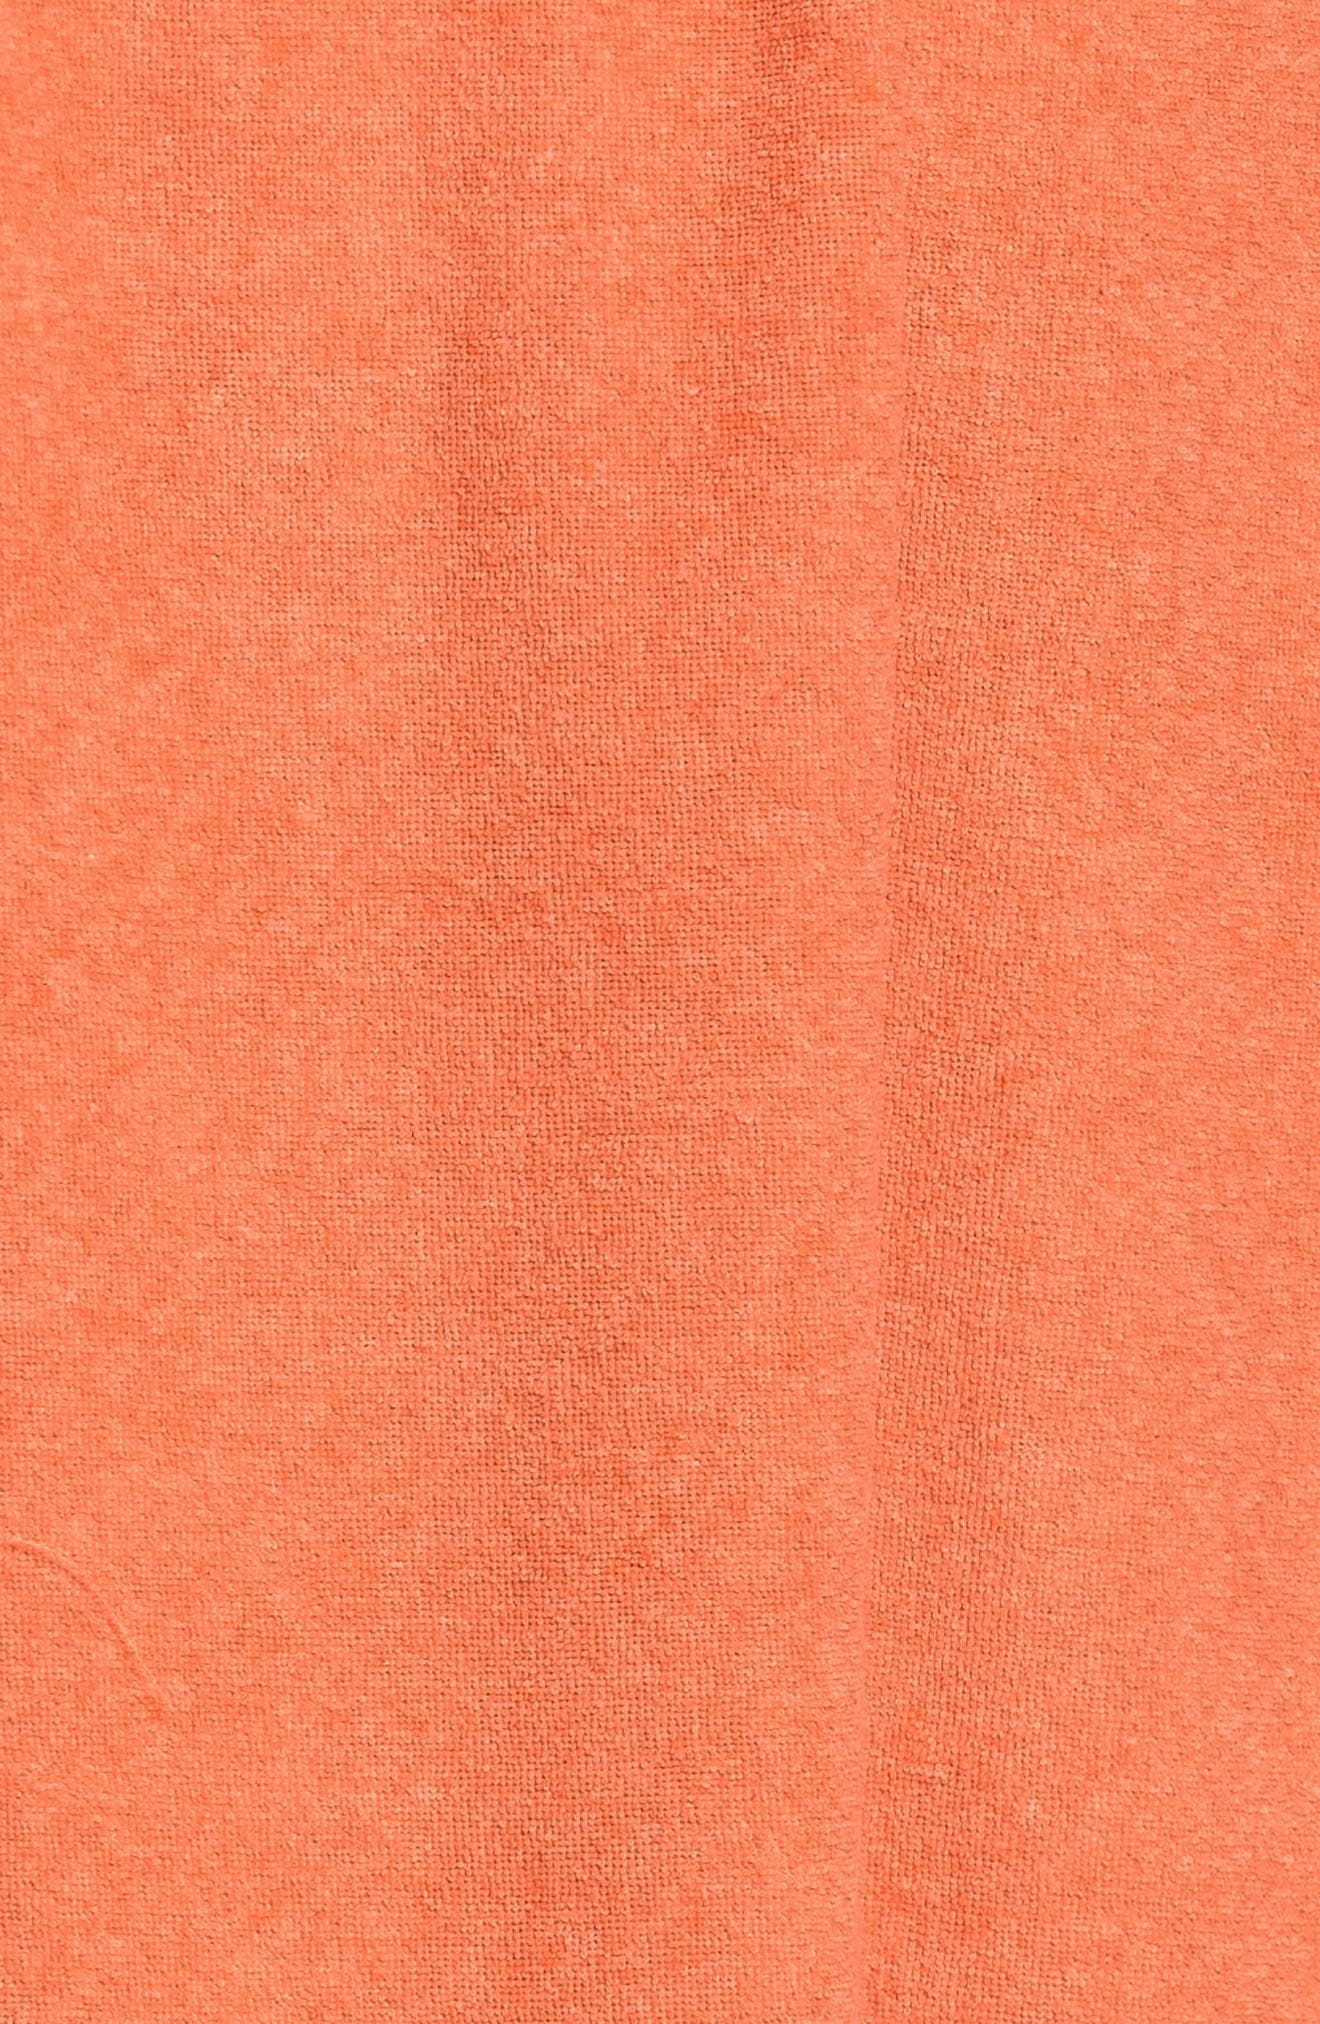 Kimono Cotton Blend Robe,                             Alternate thumbnail 10, color,